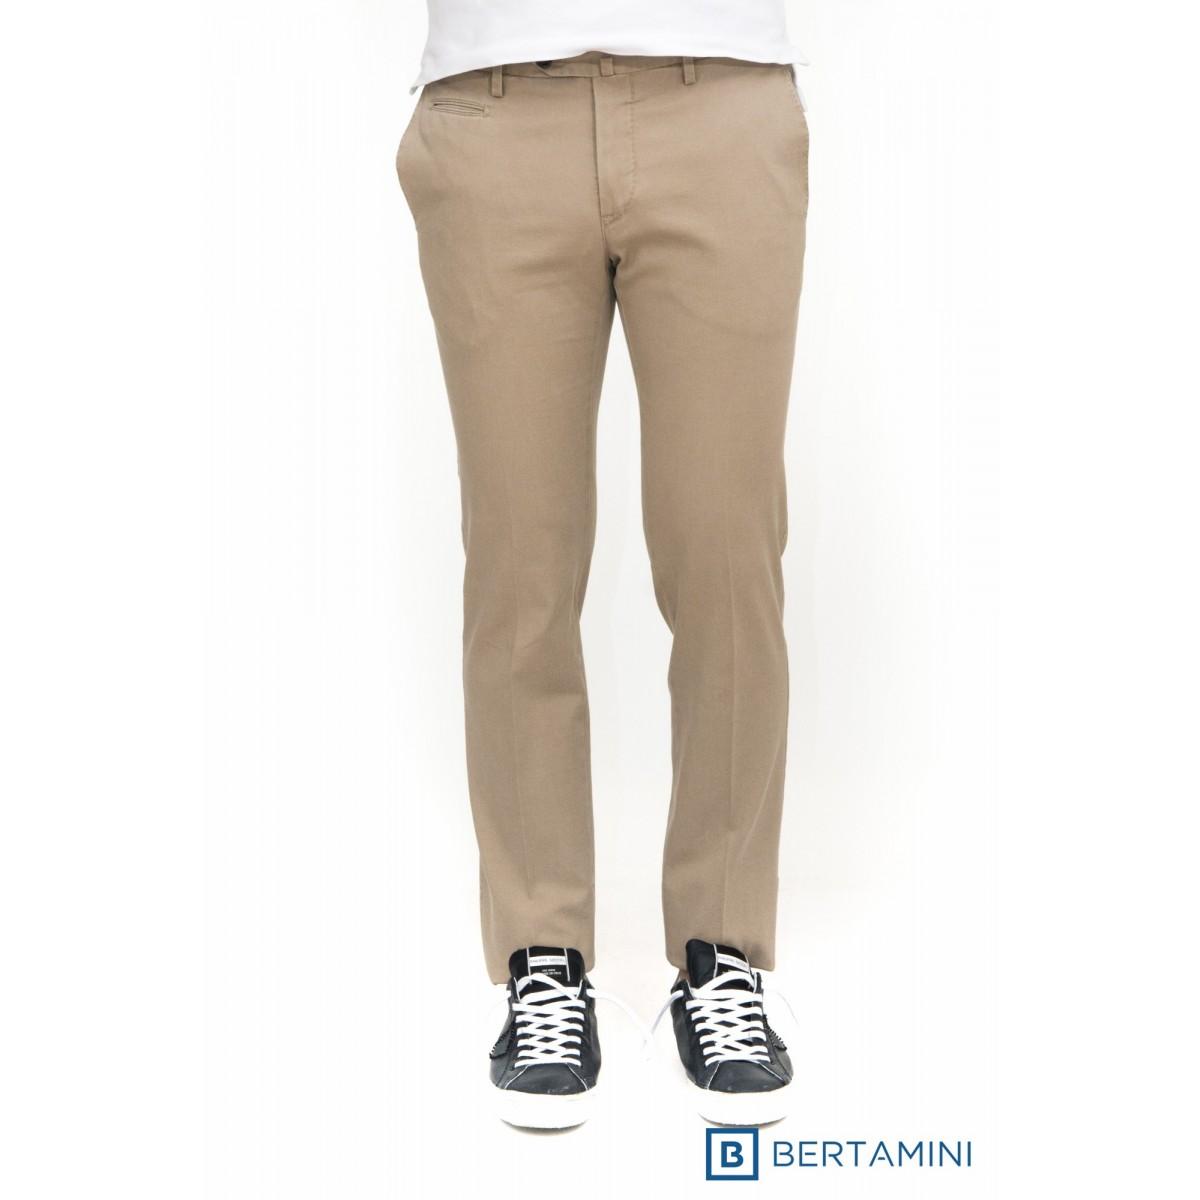 Pantalone Uomo Pt 01 - Cpdlbl Tu53 Microstruttura Strech Super Slim